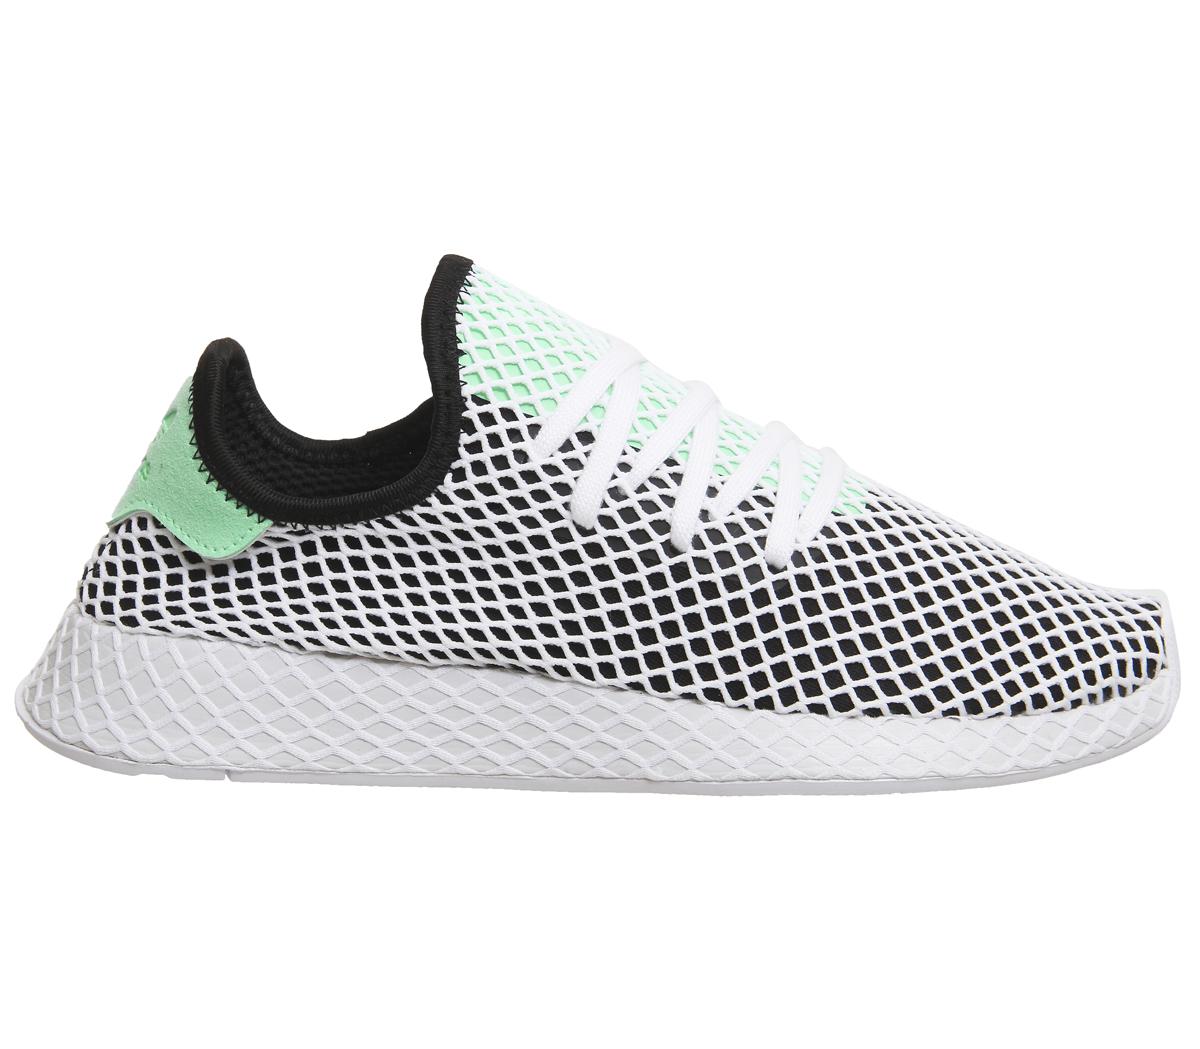 promo code 23dde 6525d Mens-Adidas-Deerupt-Trainers-CORE-BLACK-EASY-GREEN-